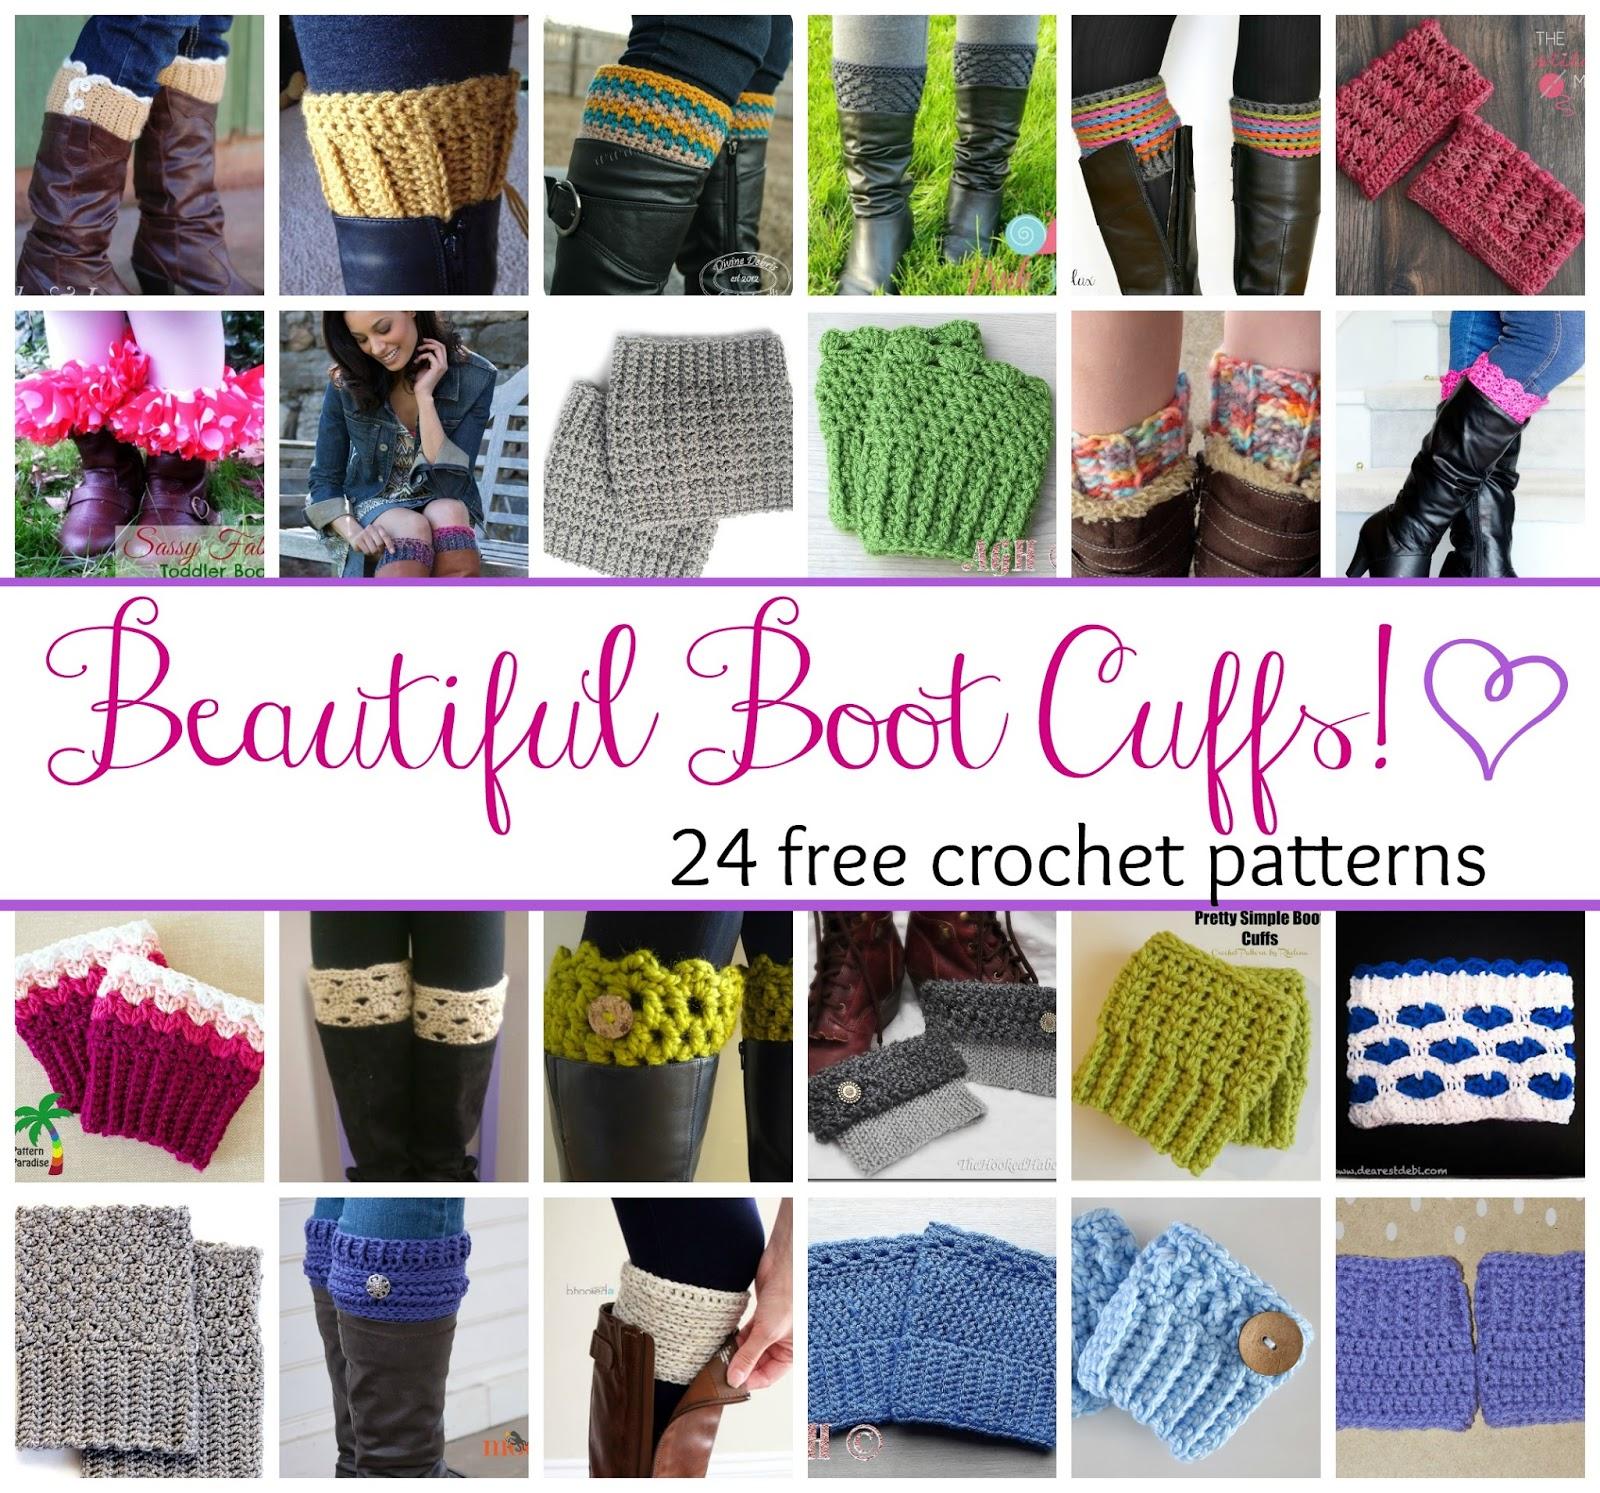 Fiber flux beautiful boot cuffs 24 free crochet patterns beautiful boot cuffs 24 free crochet patterns bankloansurffo Images